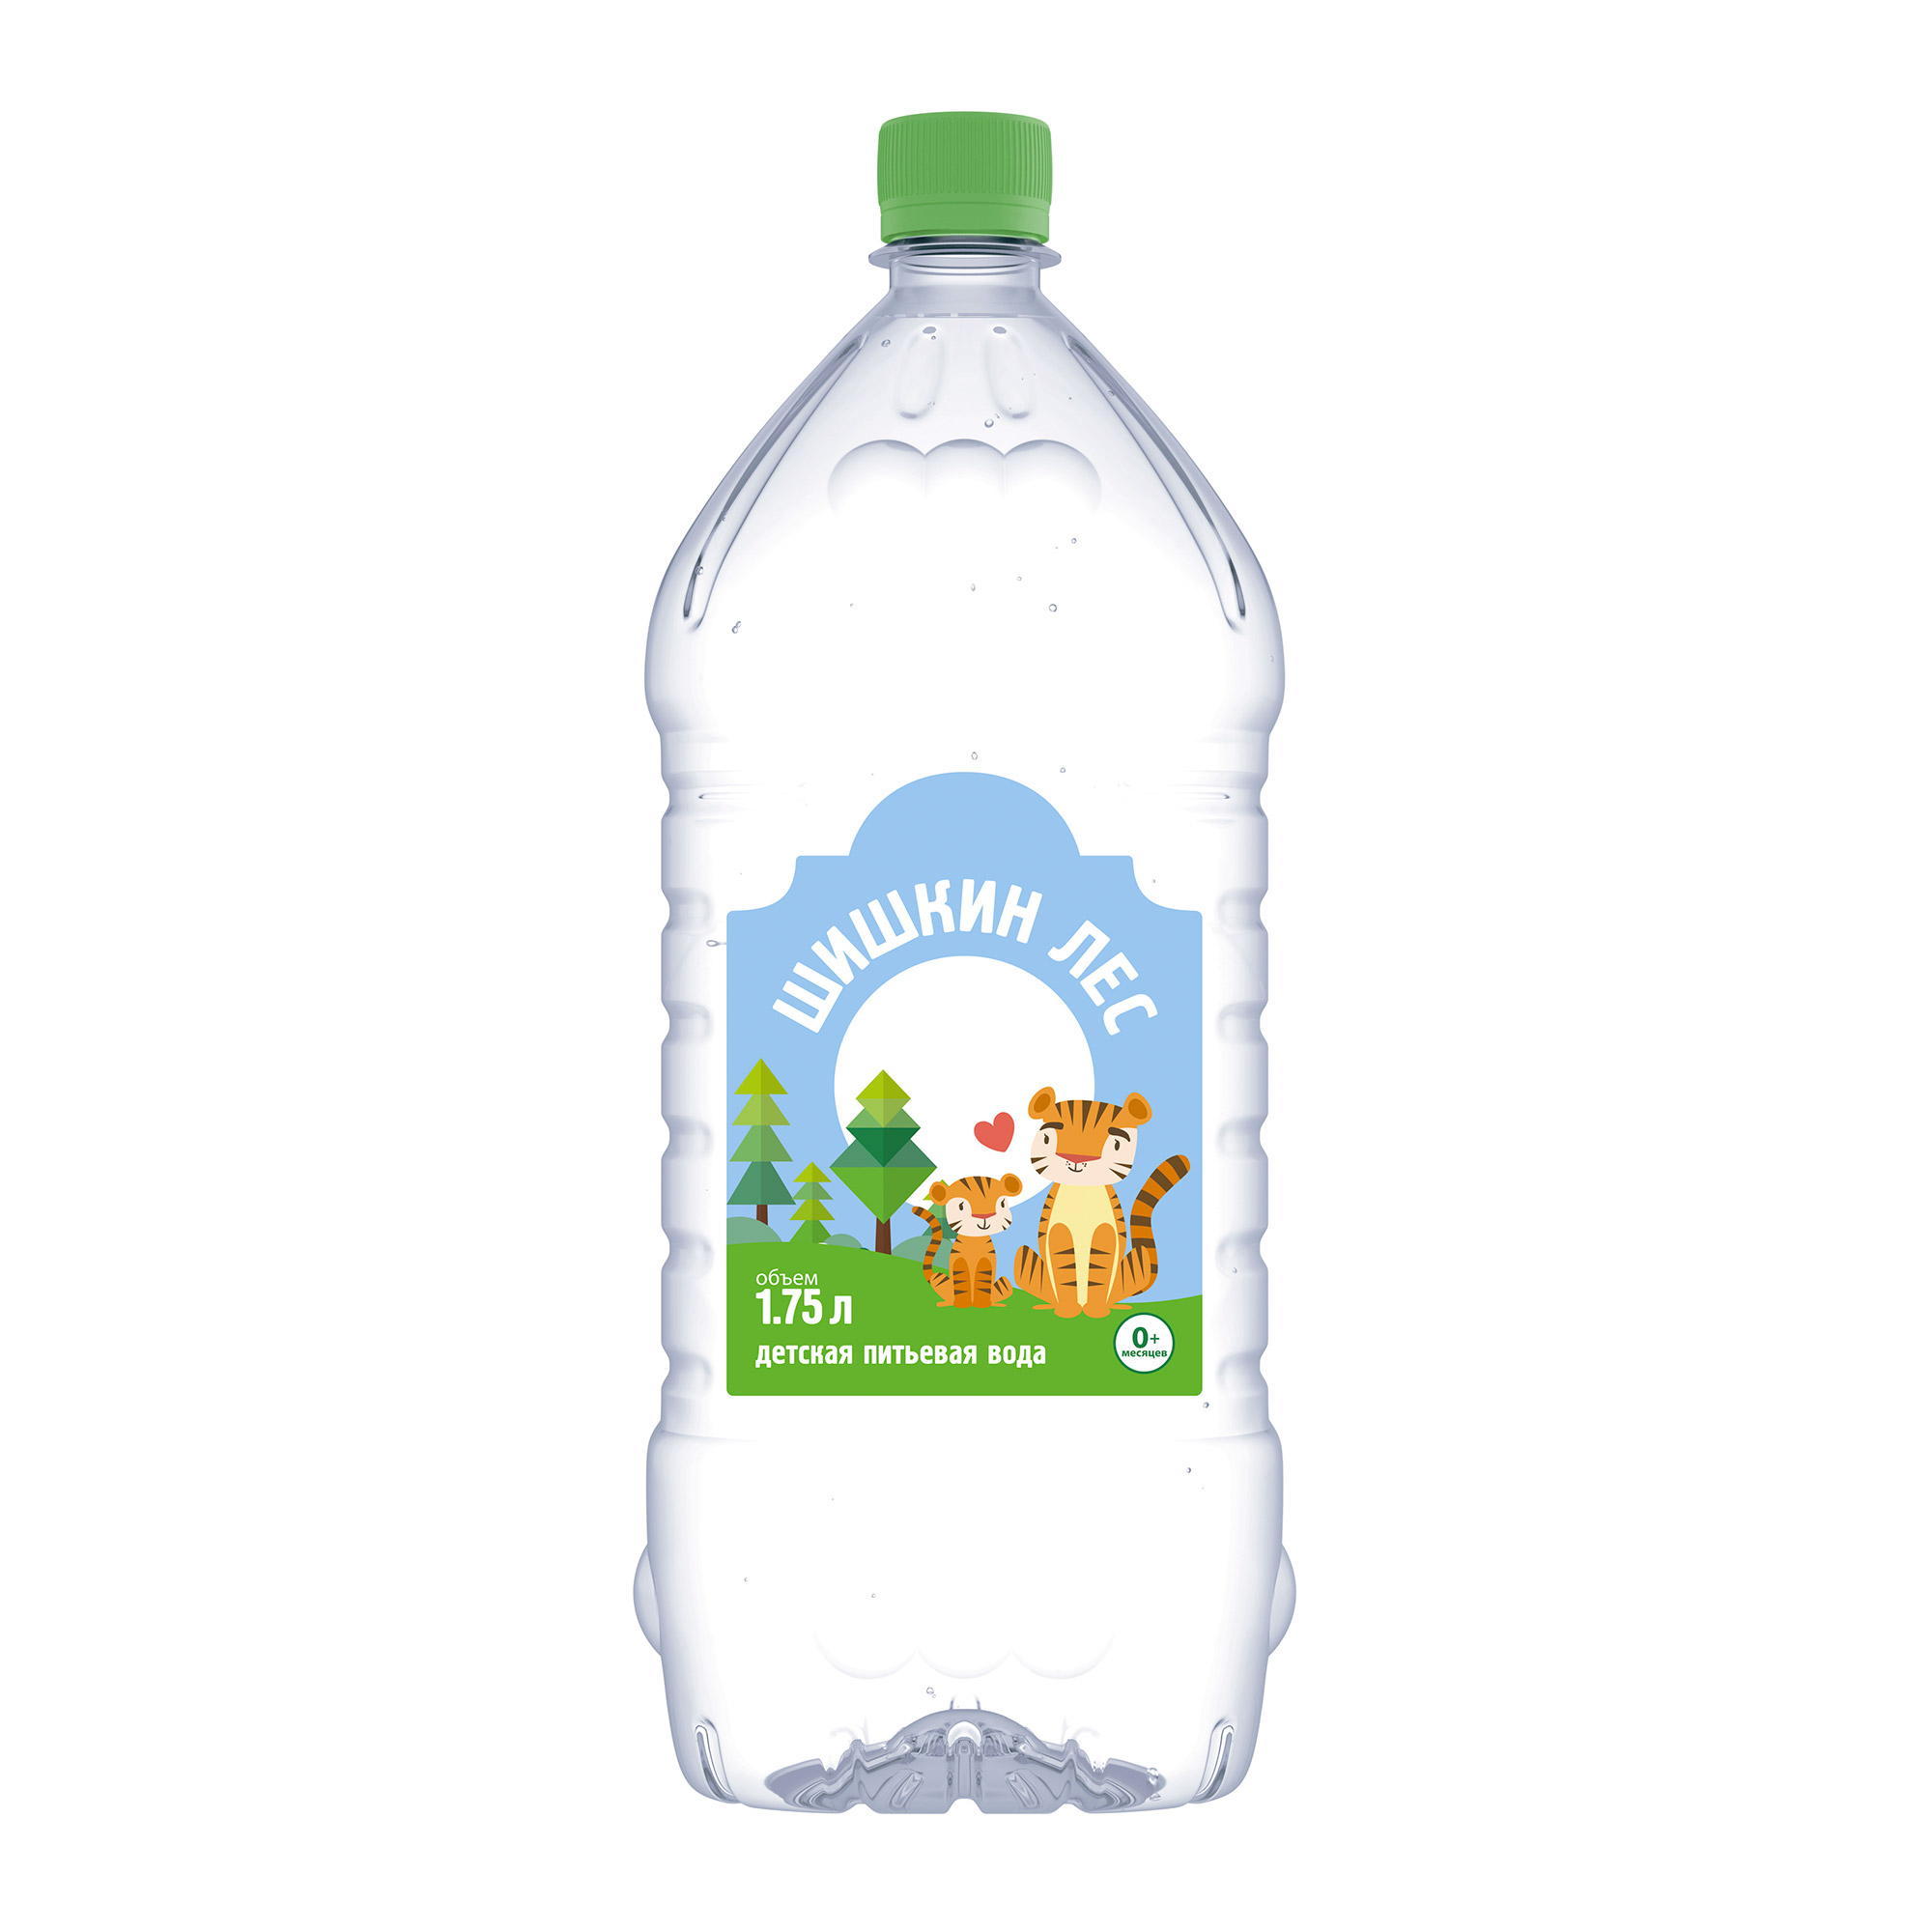 Вода детская Шишкин лес с 0 месяцев 1,75 л фото